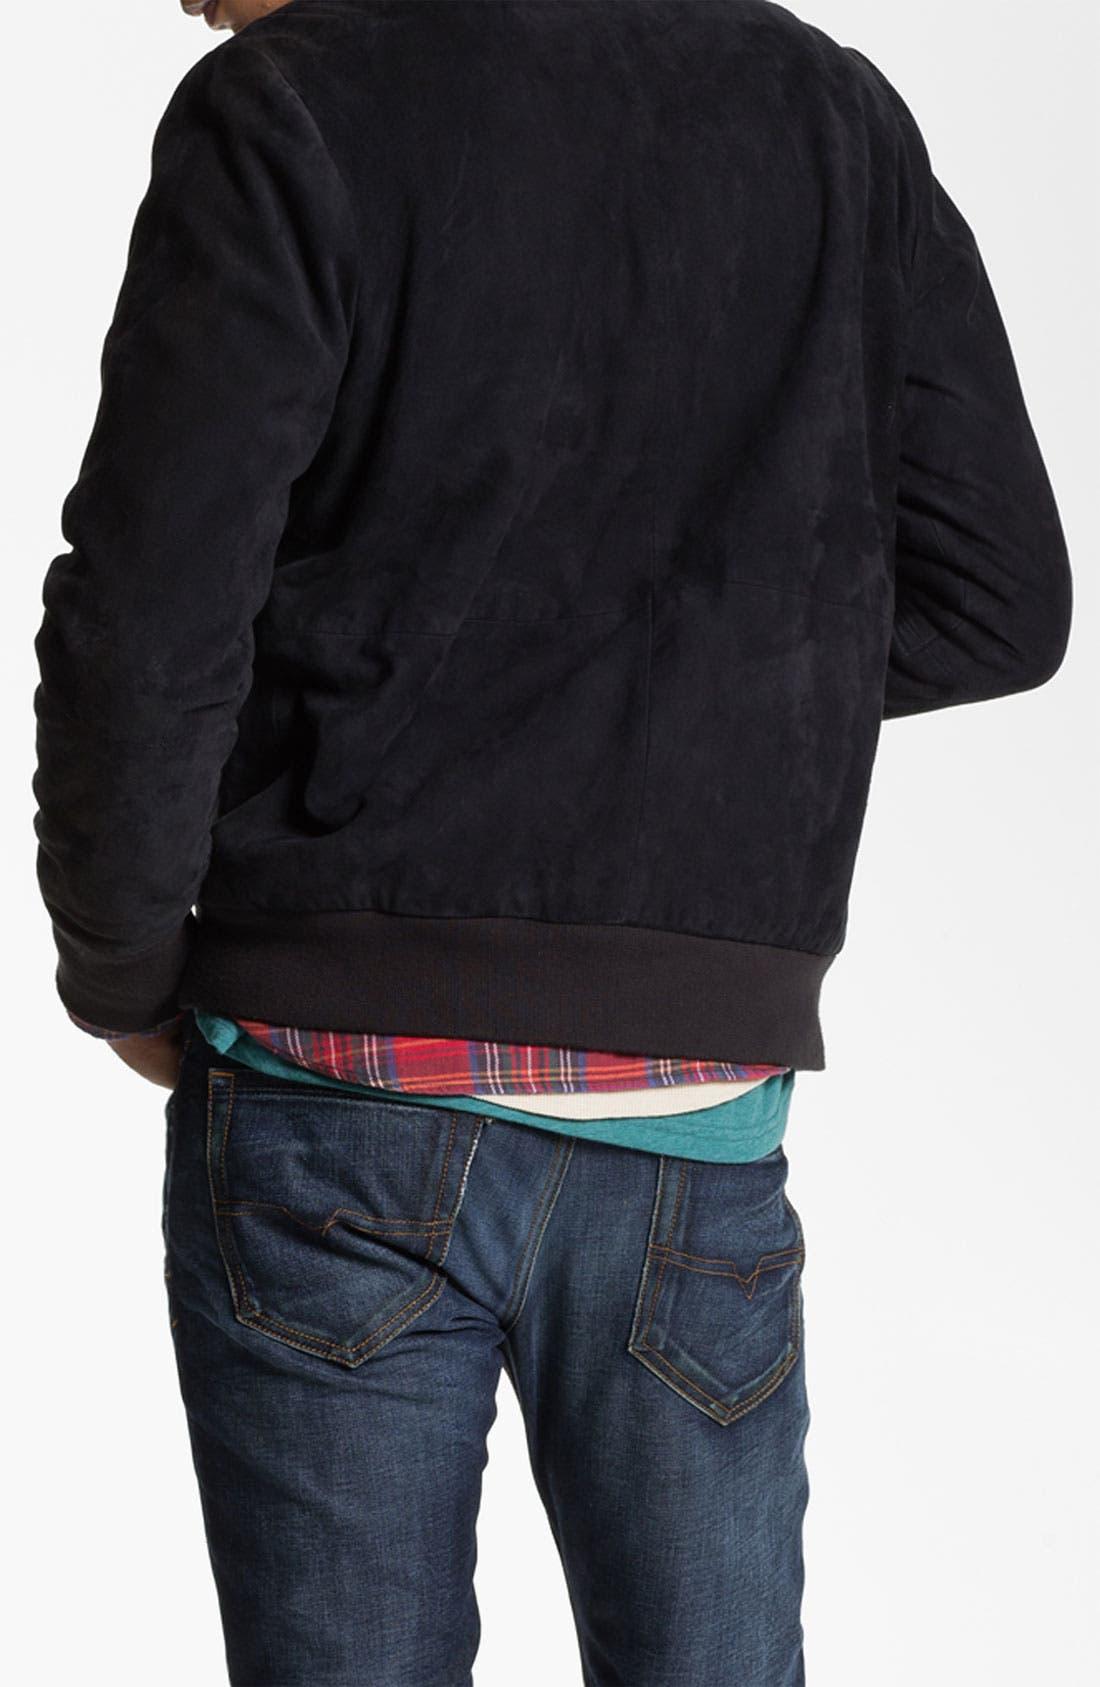 Alternate Image 2  - G-Star Raw 'Marc Newson' Suede Bomber Jacket